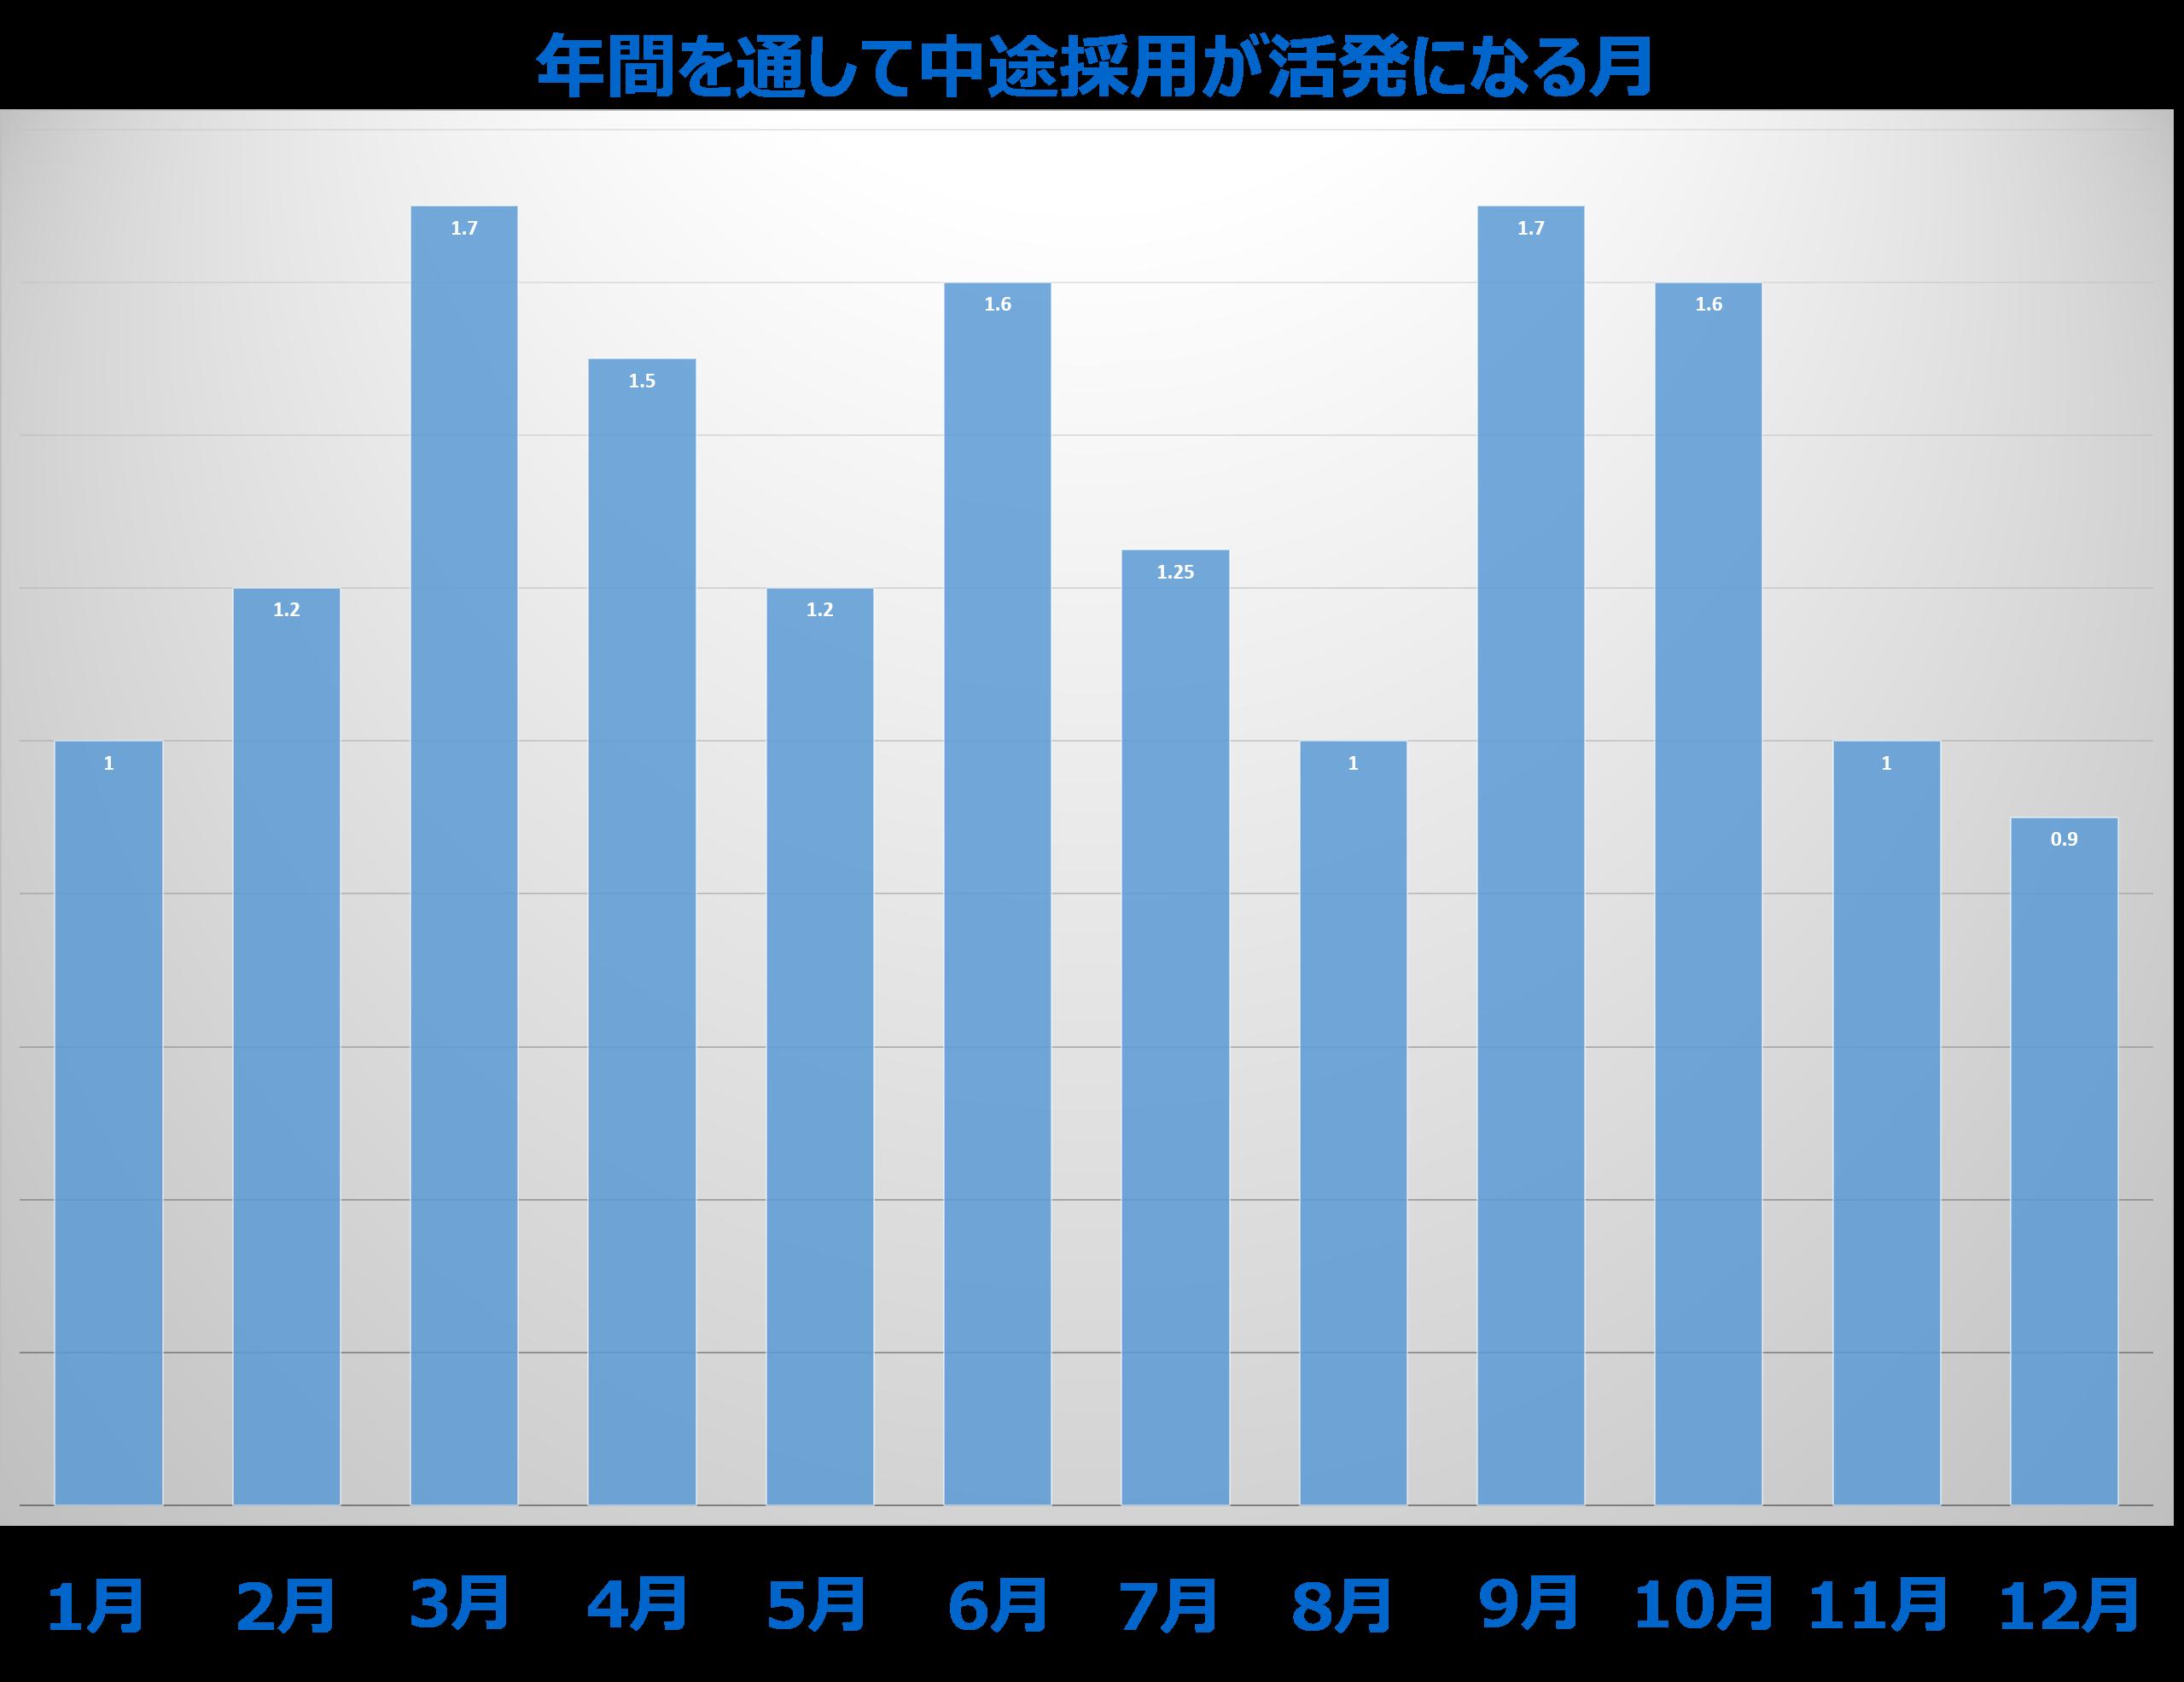 %e6%b1%82%e4%ba%ba%e3%81%8c%e5%a2%97%e3%81%88%e3%82%8b%e3%82%b0%e3%83%a9%e3%83%95